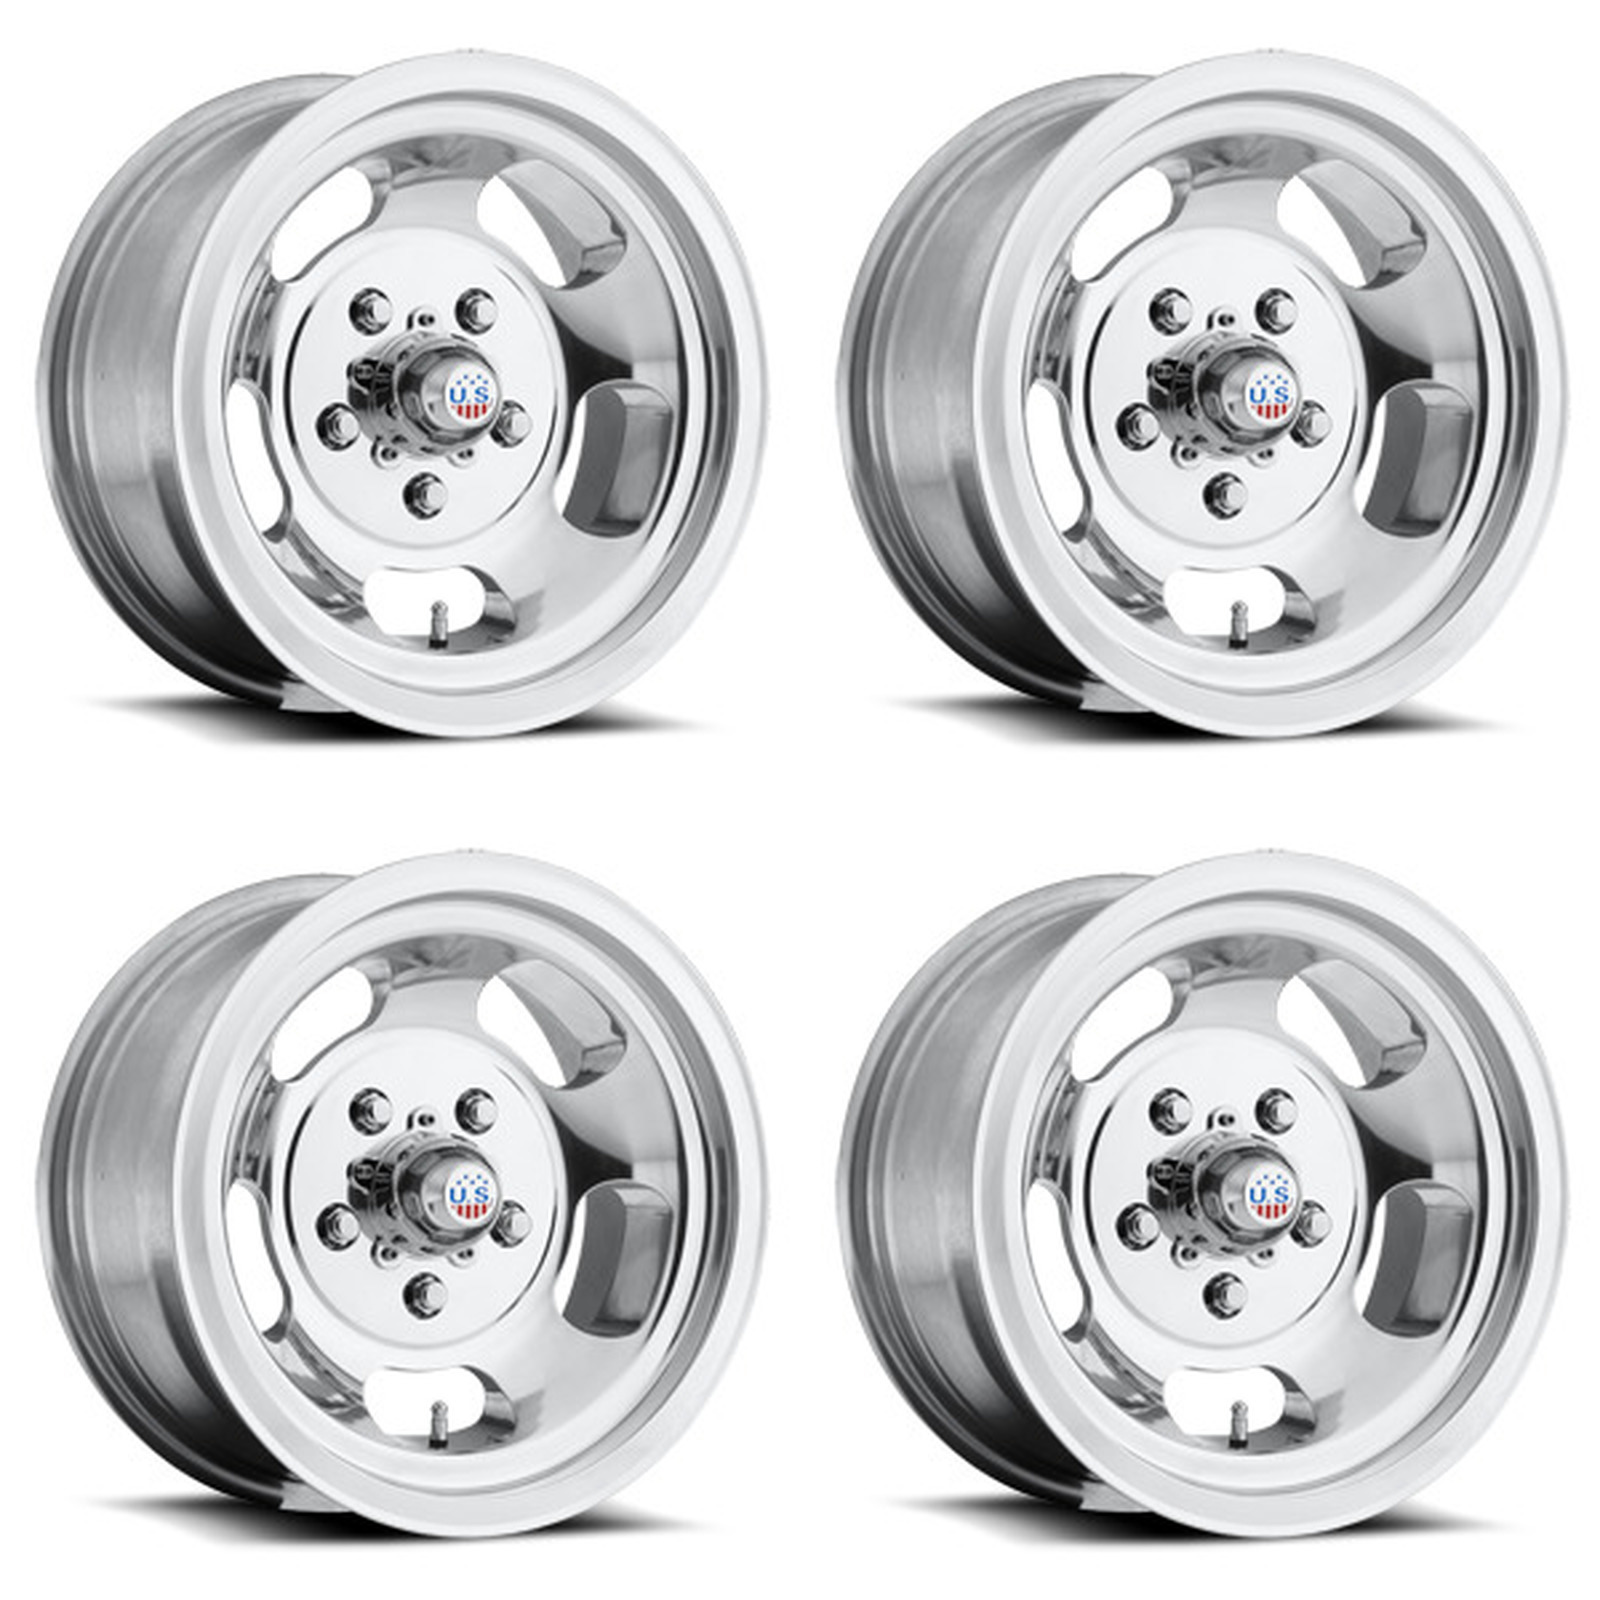 15x8 Us Mag Indy U101 6x5.5 et-12 Polished Wheel 1